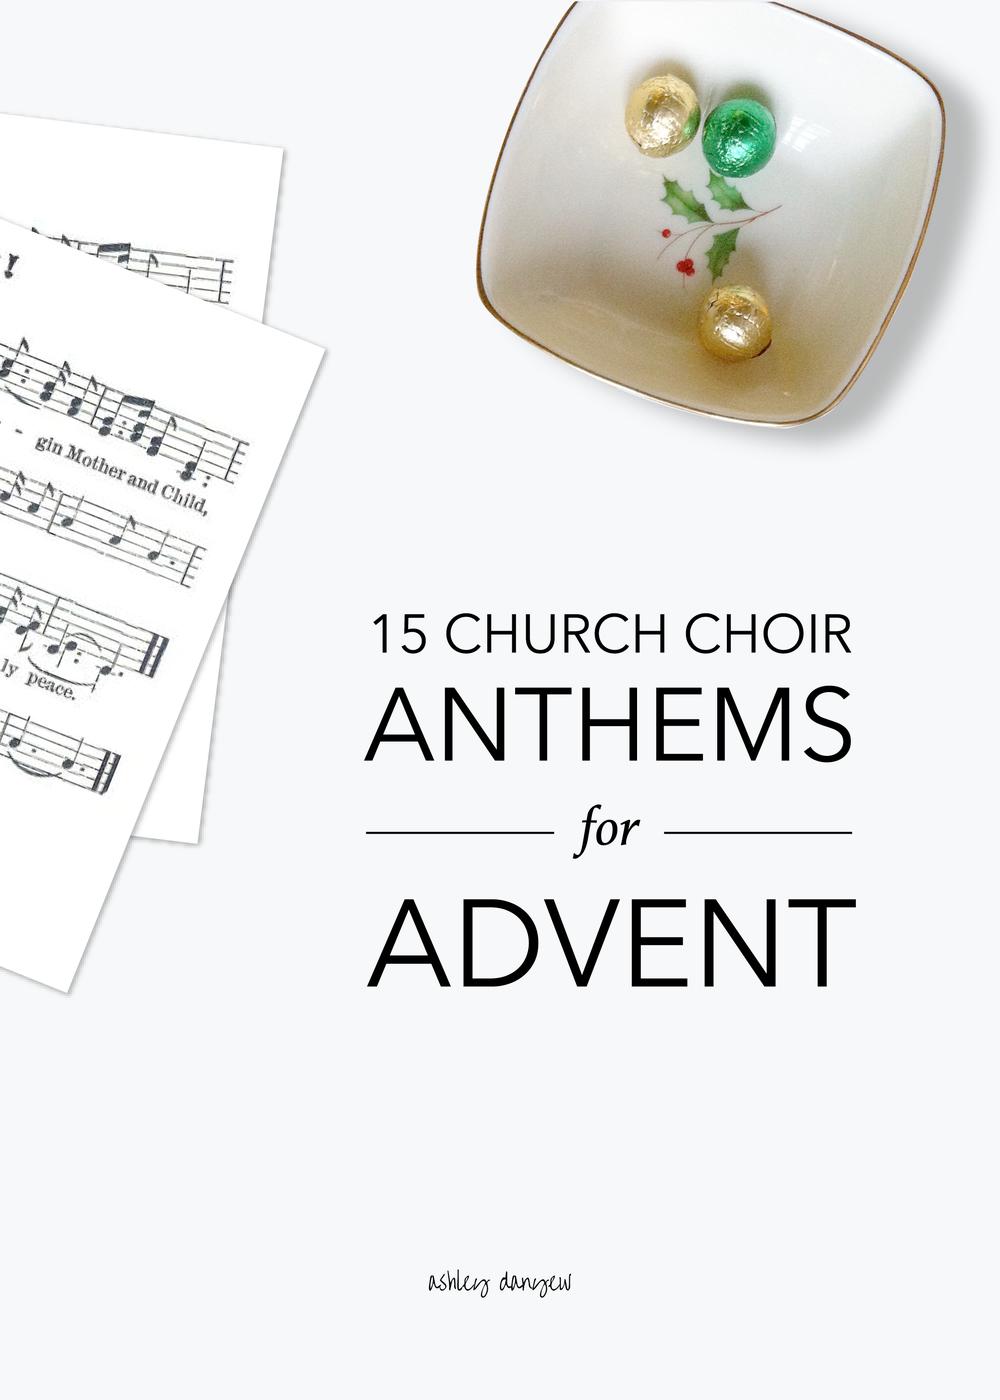 Copy of 15 Church Choir Anthems for Advent